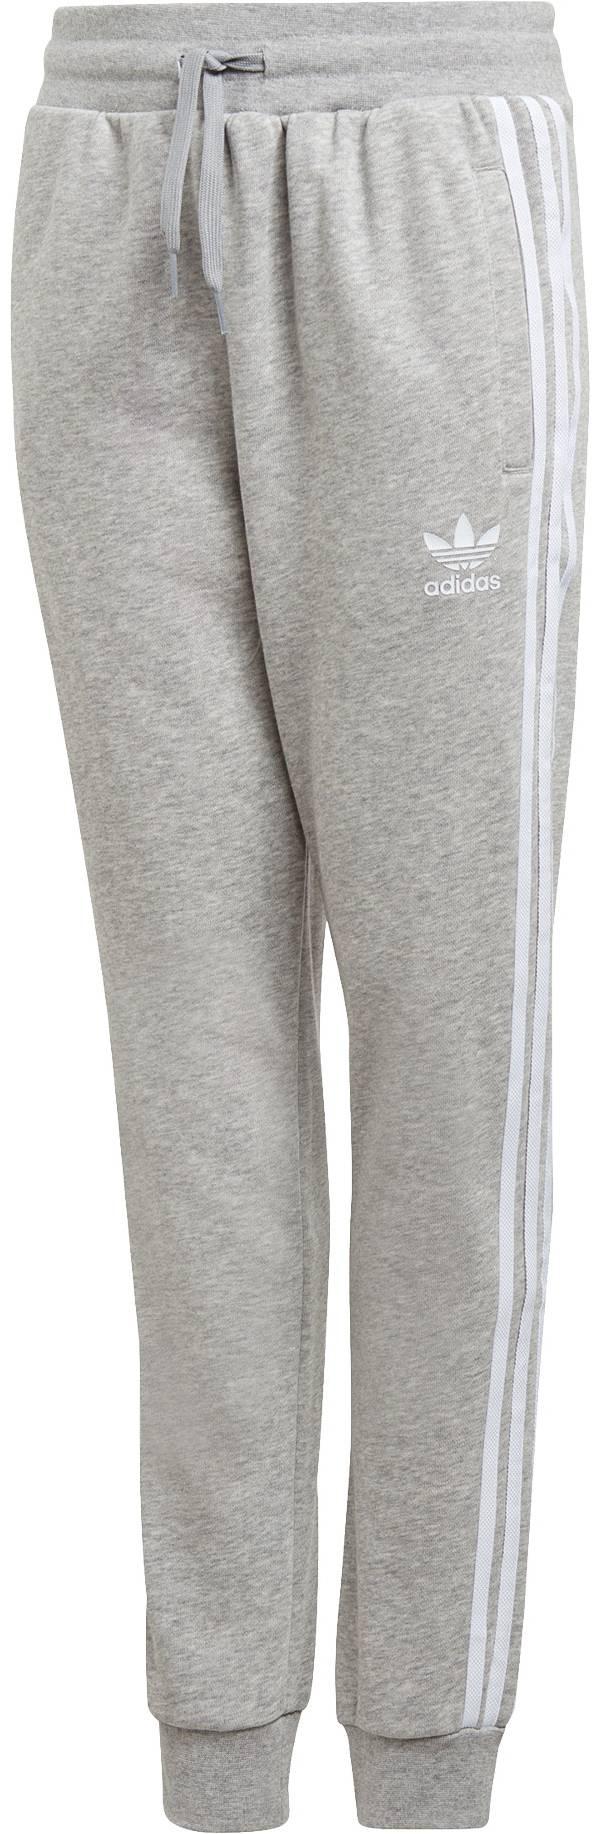 adidas Originals Boys' 3-Stripe Track Pants product image